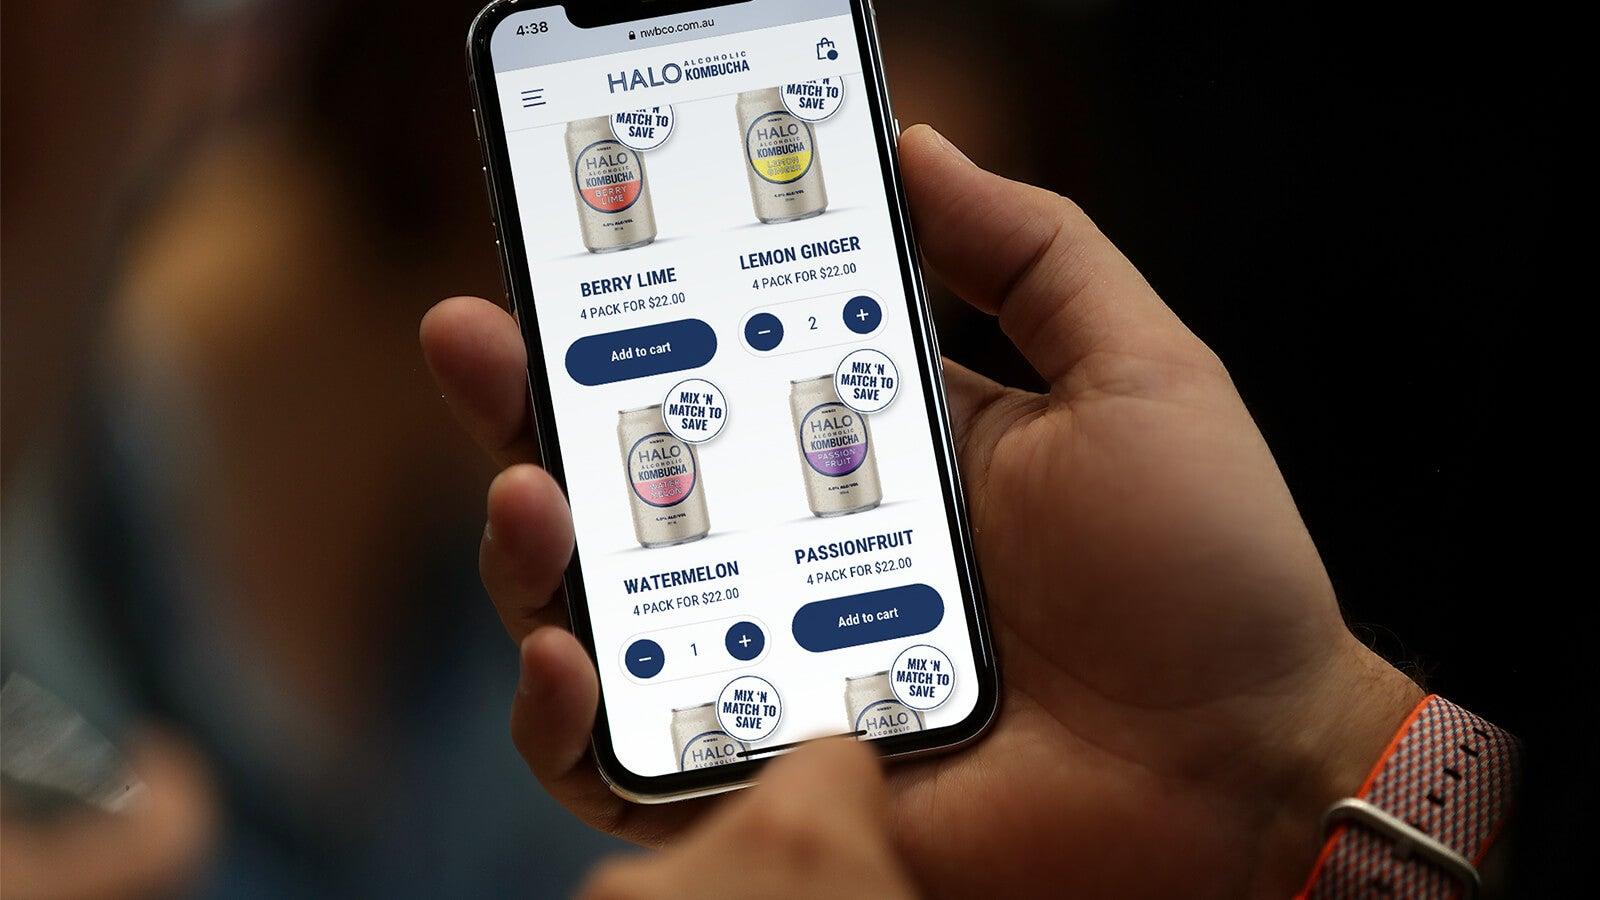 Halo Alcoholic Kombucha | product page on mobile | Devotion